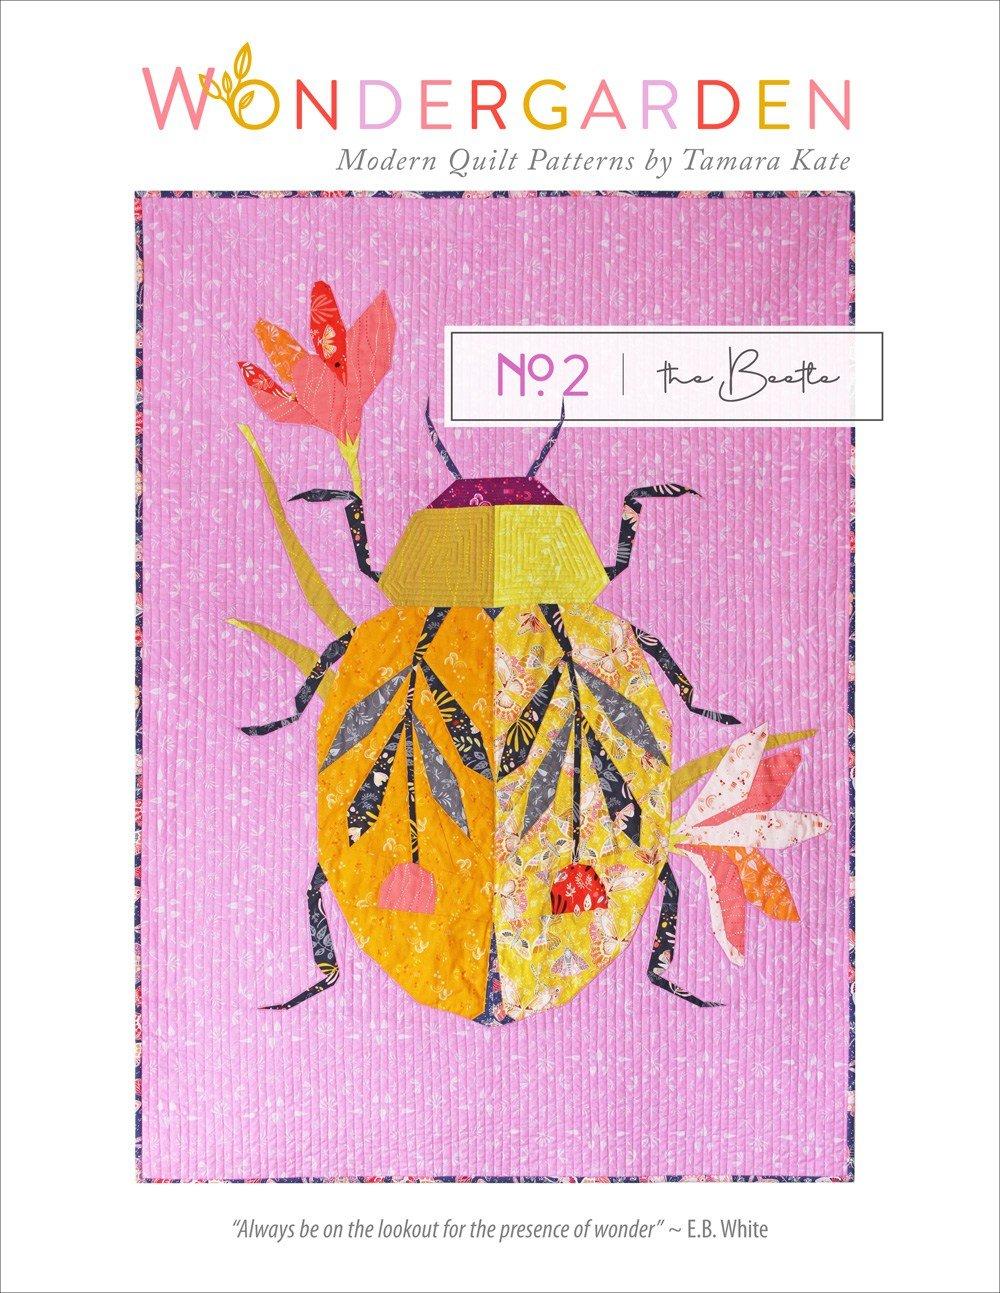 WonderGarden No. 2 the Beetle by Tamara Kate